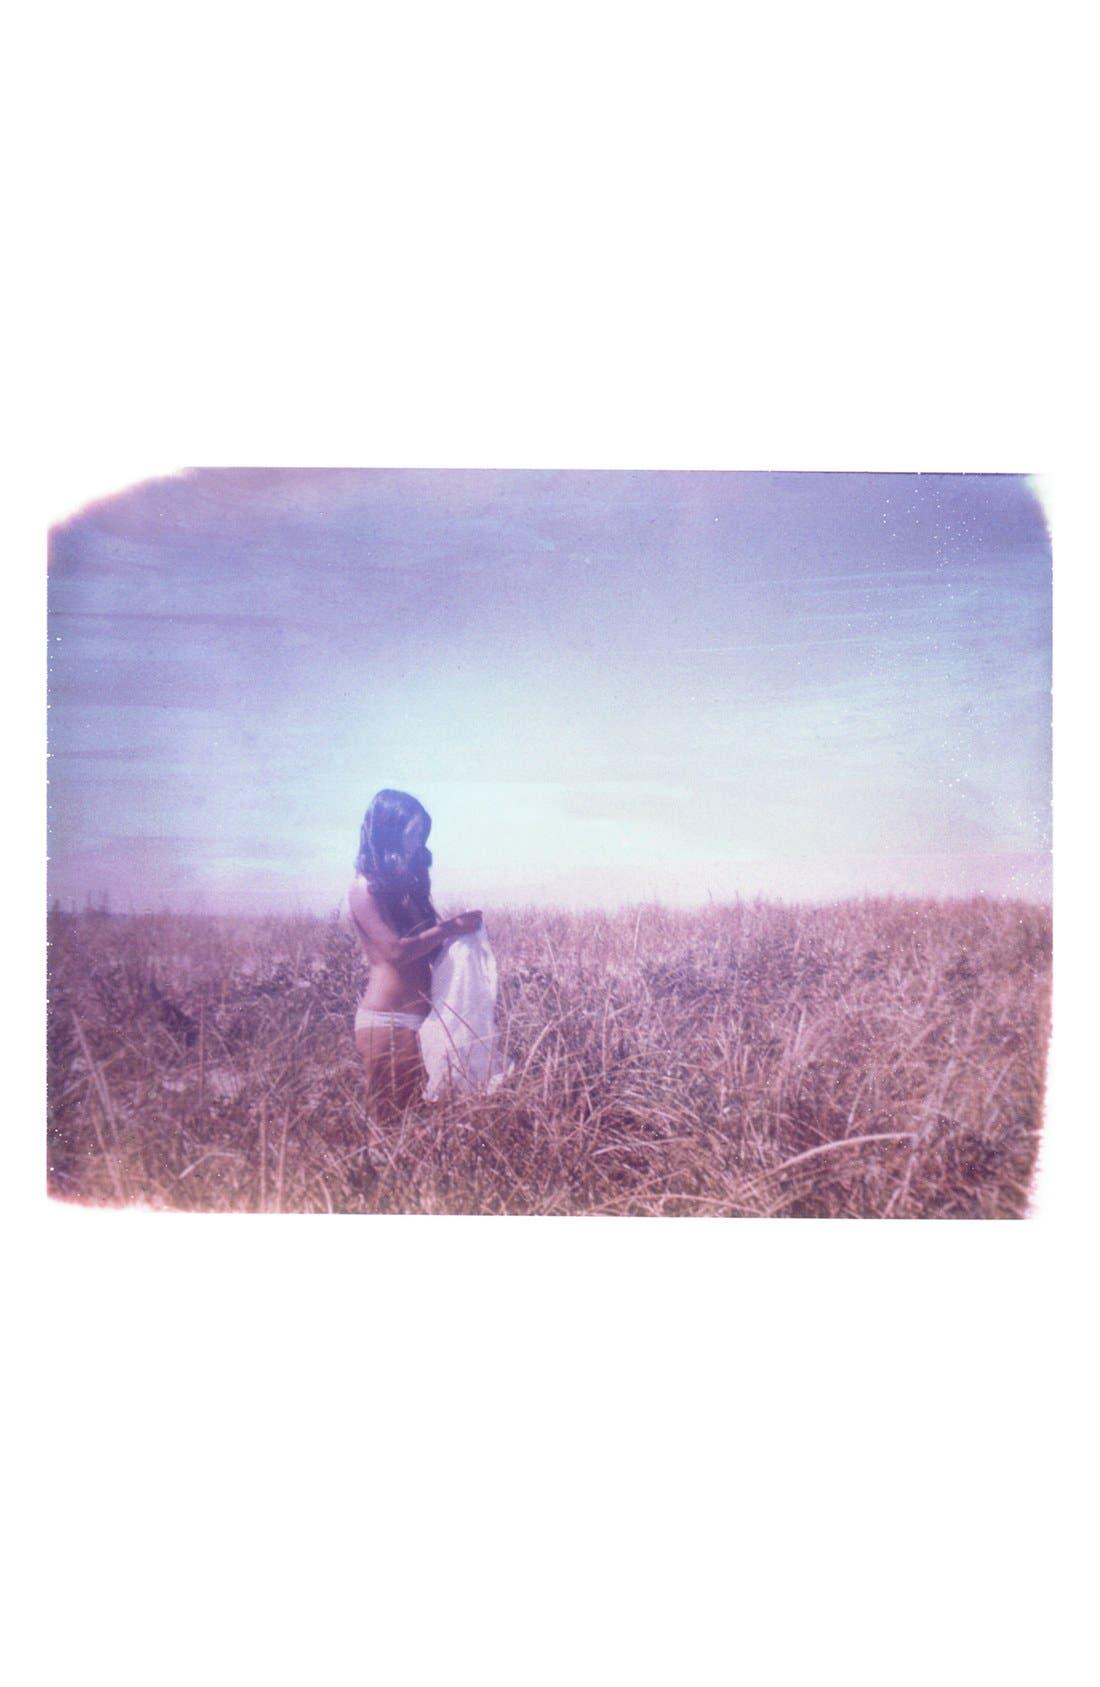 Alternate Image 1 Selected - She Hit Pause Studios 'Girl in Field' Wall Art